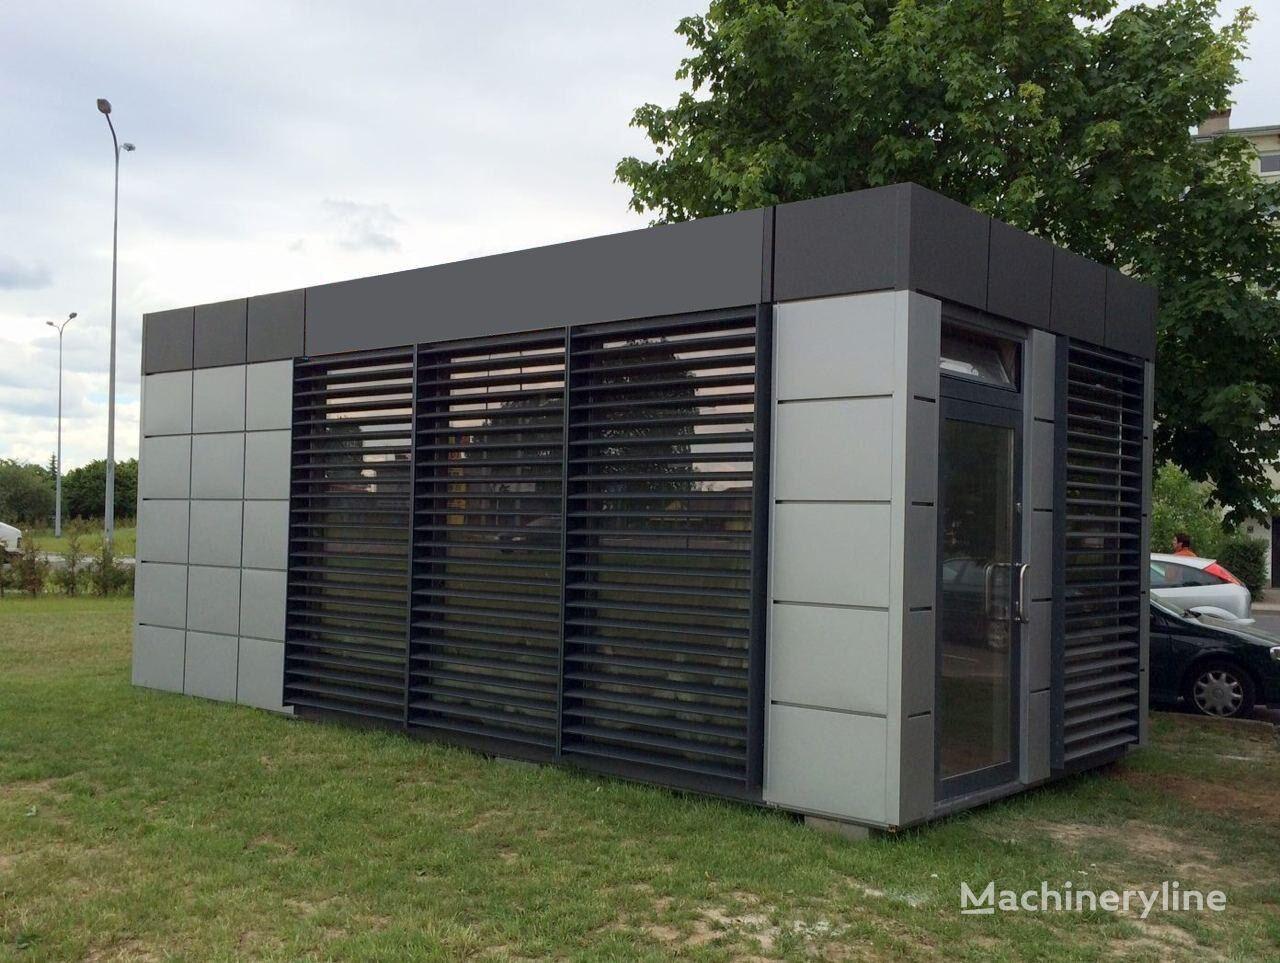 conteneur bureau IDEX Office Container, SKLEP, KIOSK, BIURO MOBILNE, SHOP, PAVILI neuf